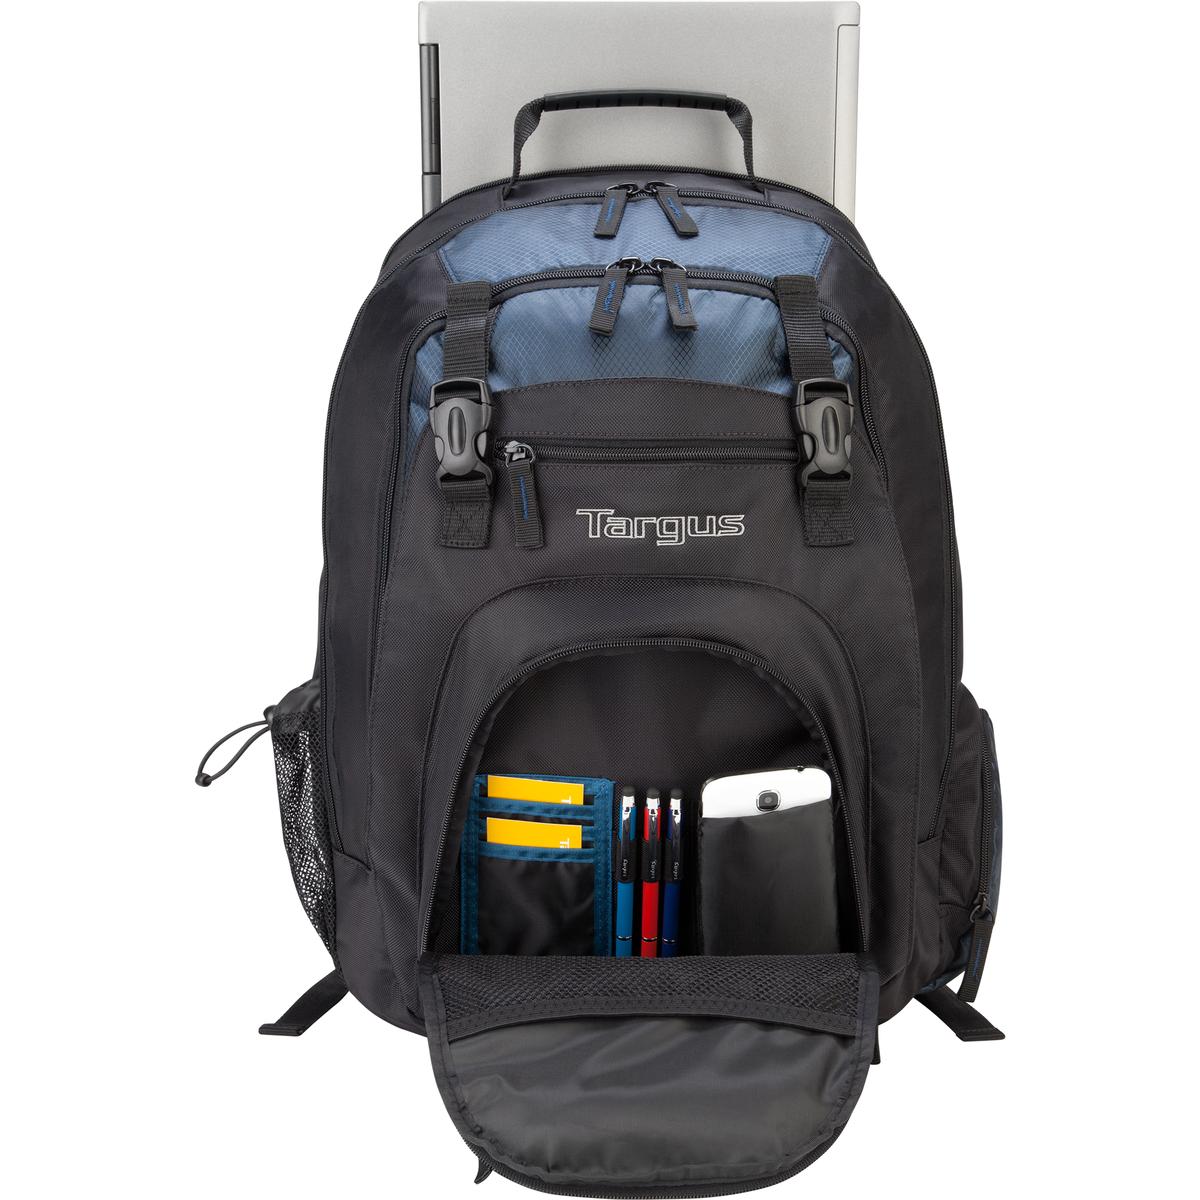 "17"" XL Laptop Backpack - TXL617 - Black/Blue: Backpacks: Targus"